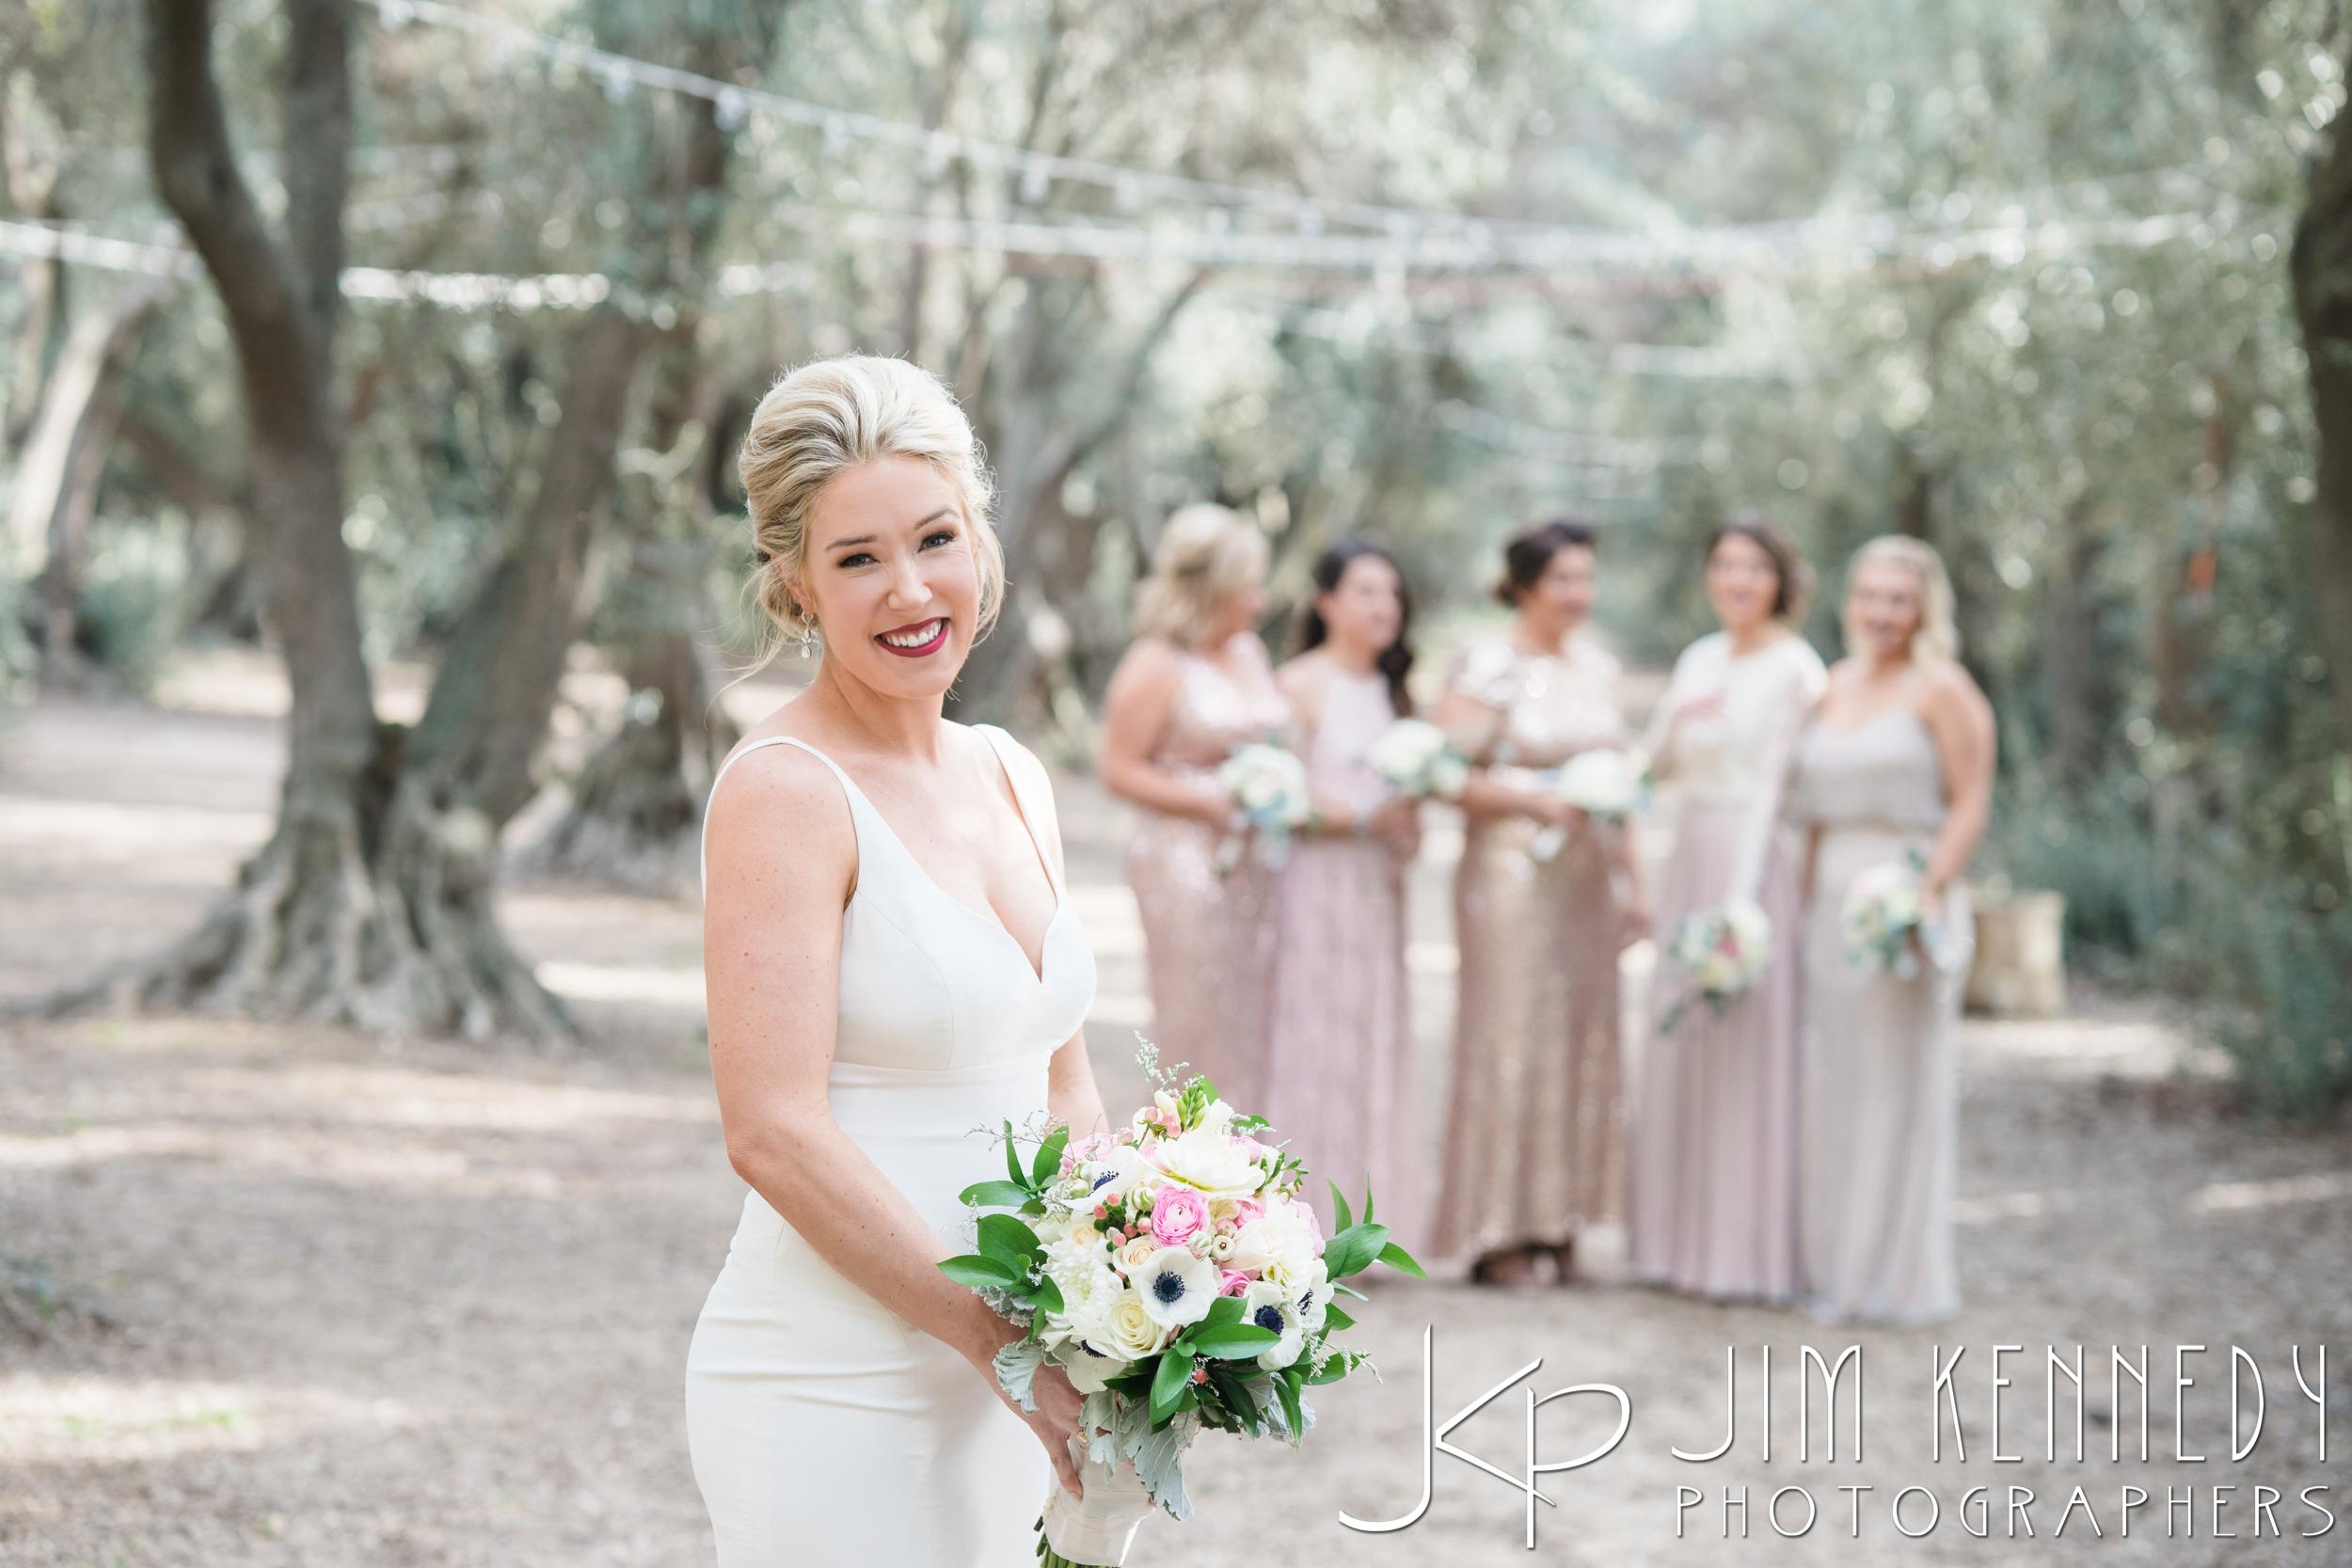 jim_kennedy_photographers_highland_springs_wedding_caitlyn_0074.jpg